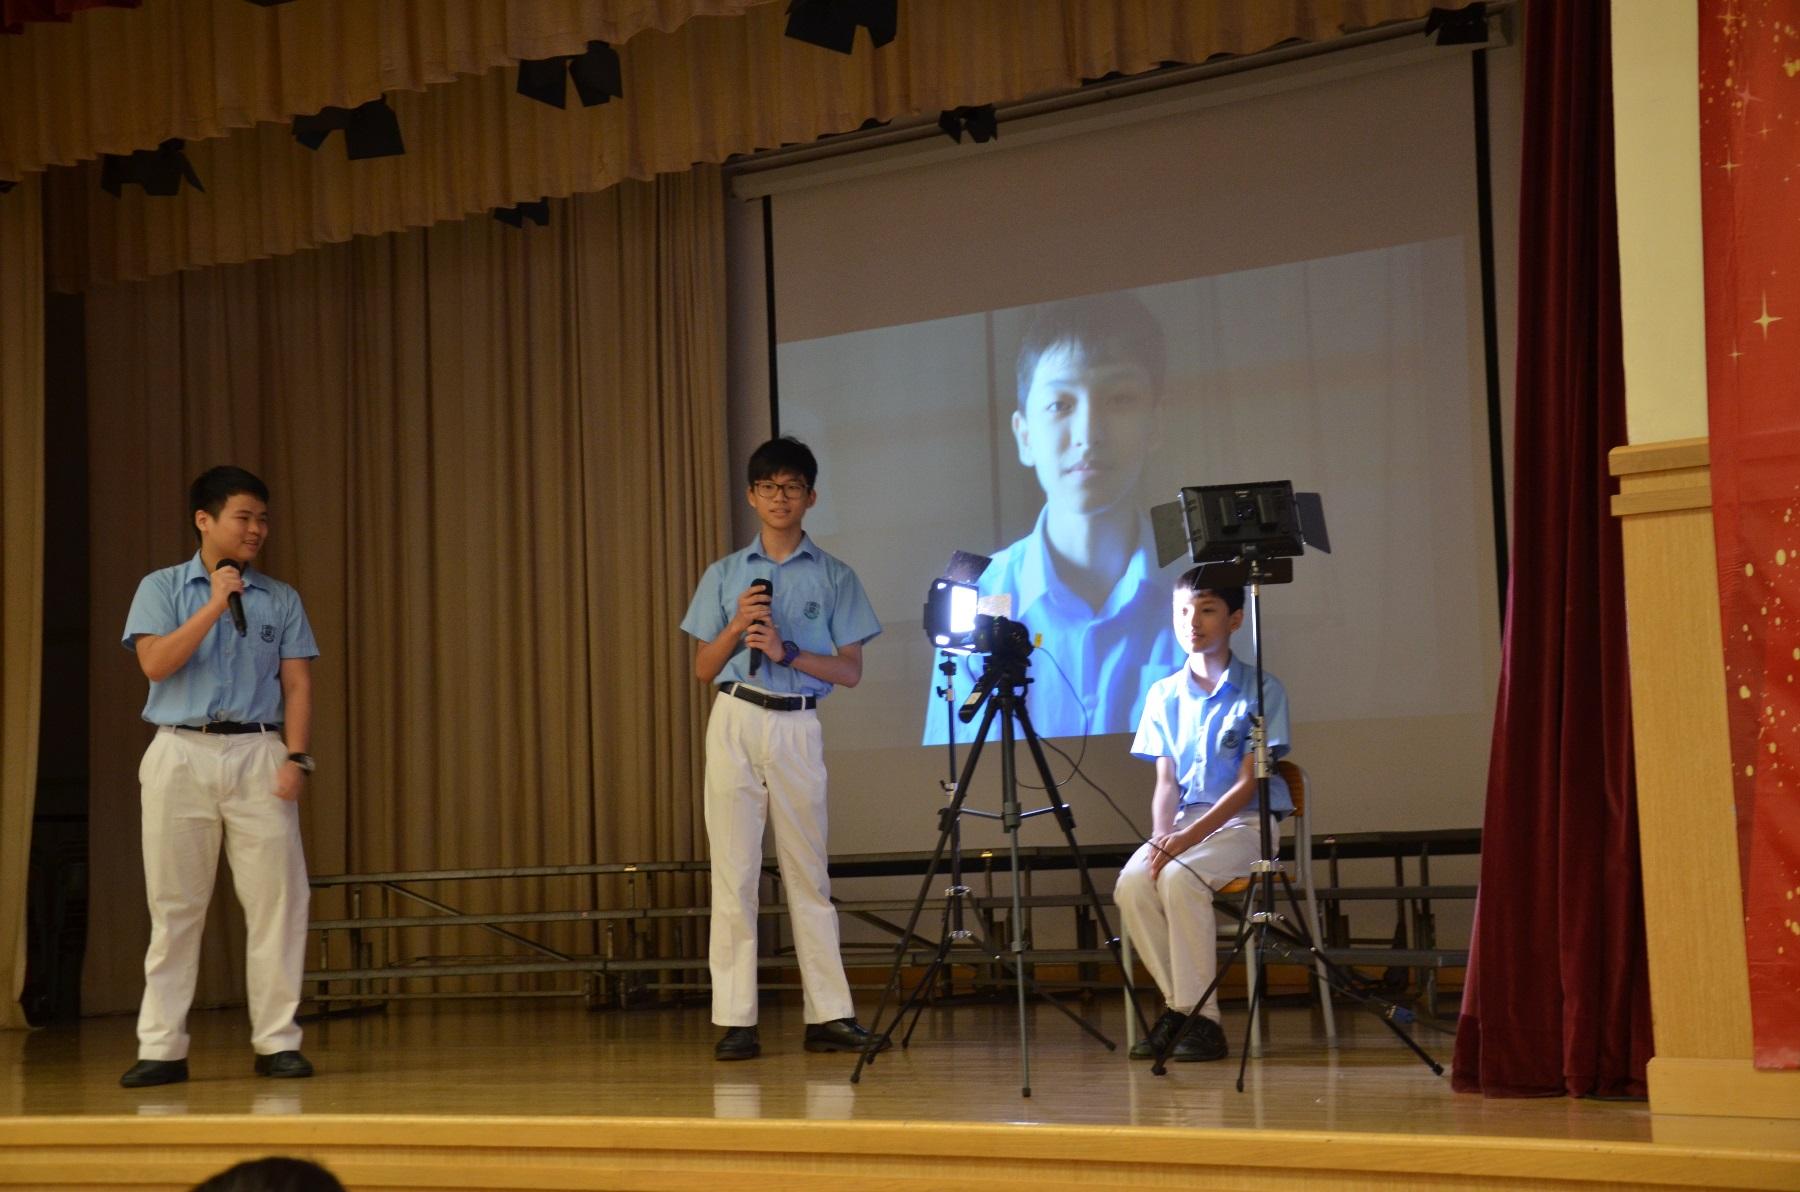 http://www.npc.edu.hk/sites/default/files/dsc_7119.jpg